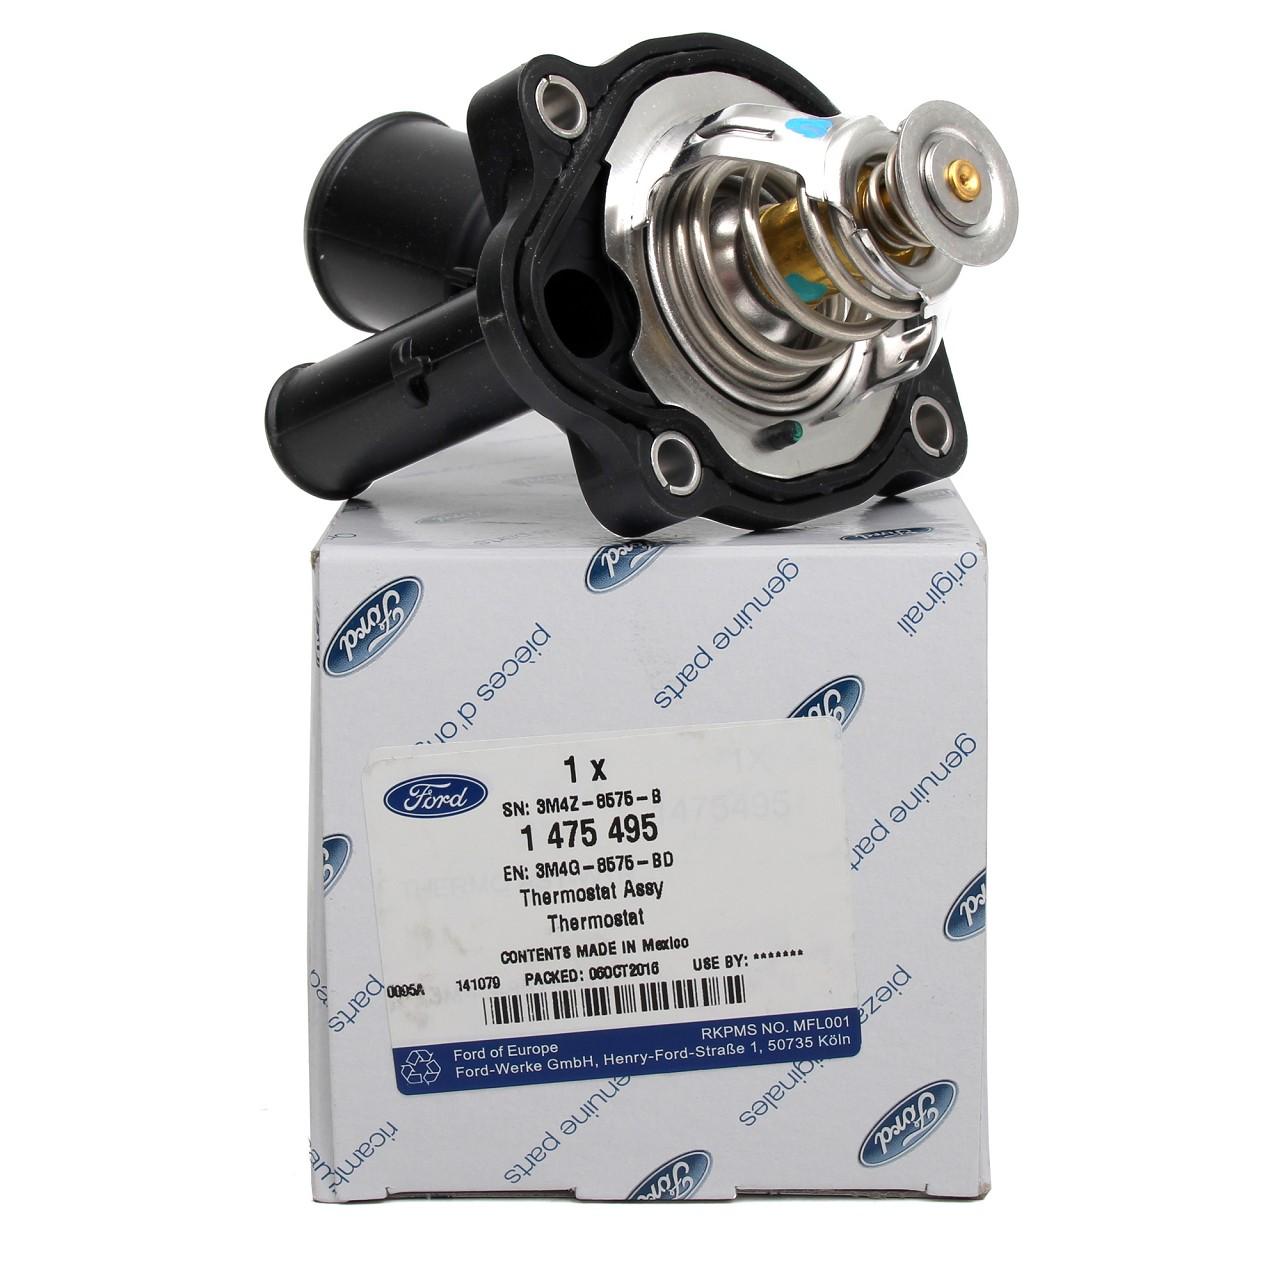 ORIGINAL Ford Thermostat + Gehäuse MONDEO IV GALAXY S-MAX (WA6) 2.3 1475495